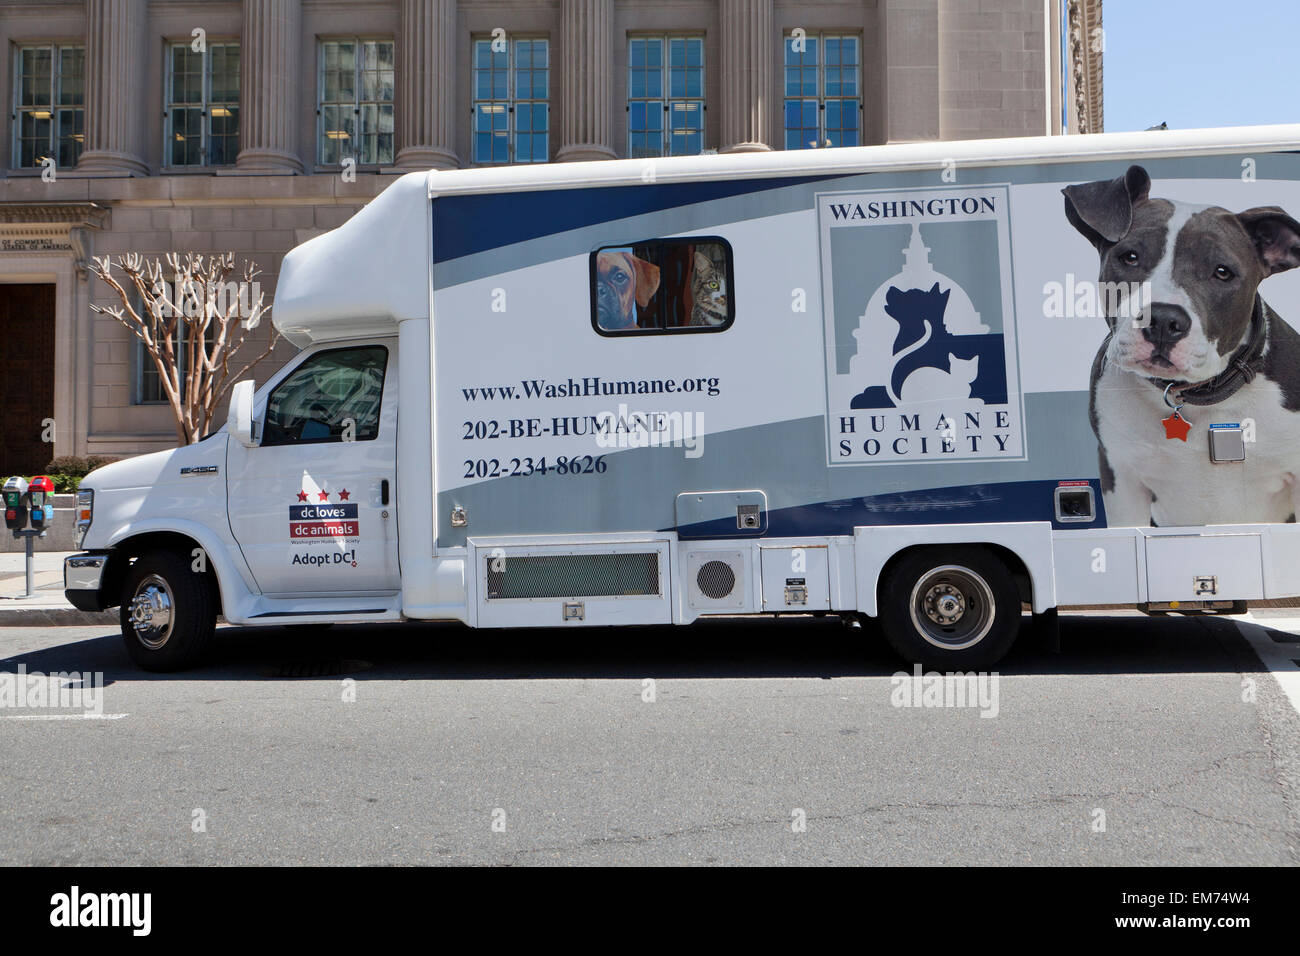 Washington humane society van - Washington, DC USA - Stock Image